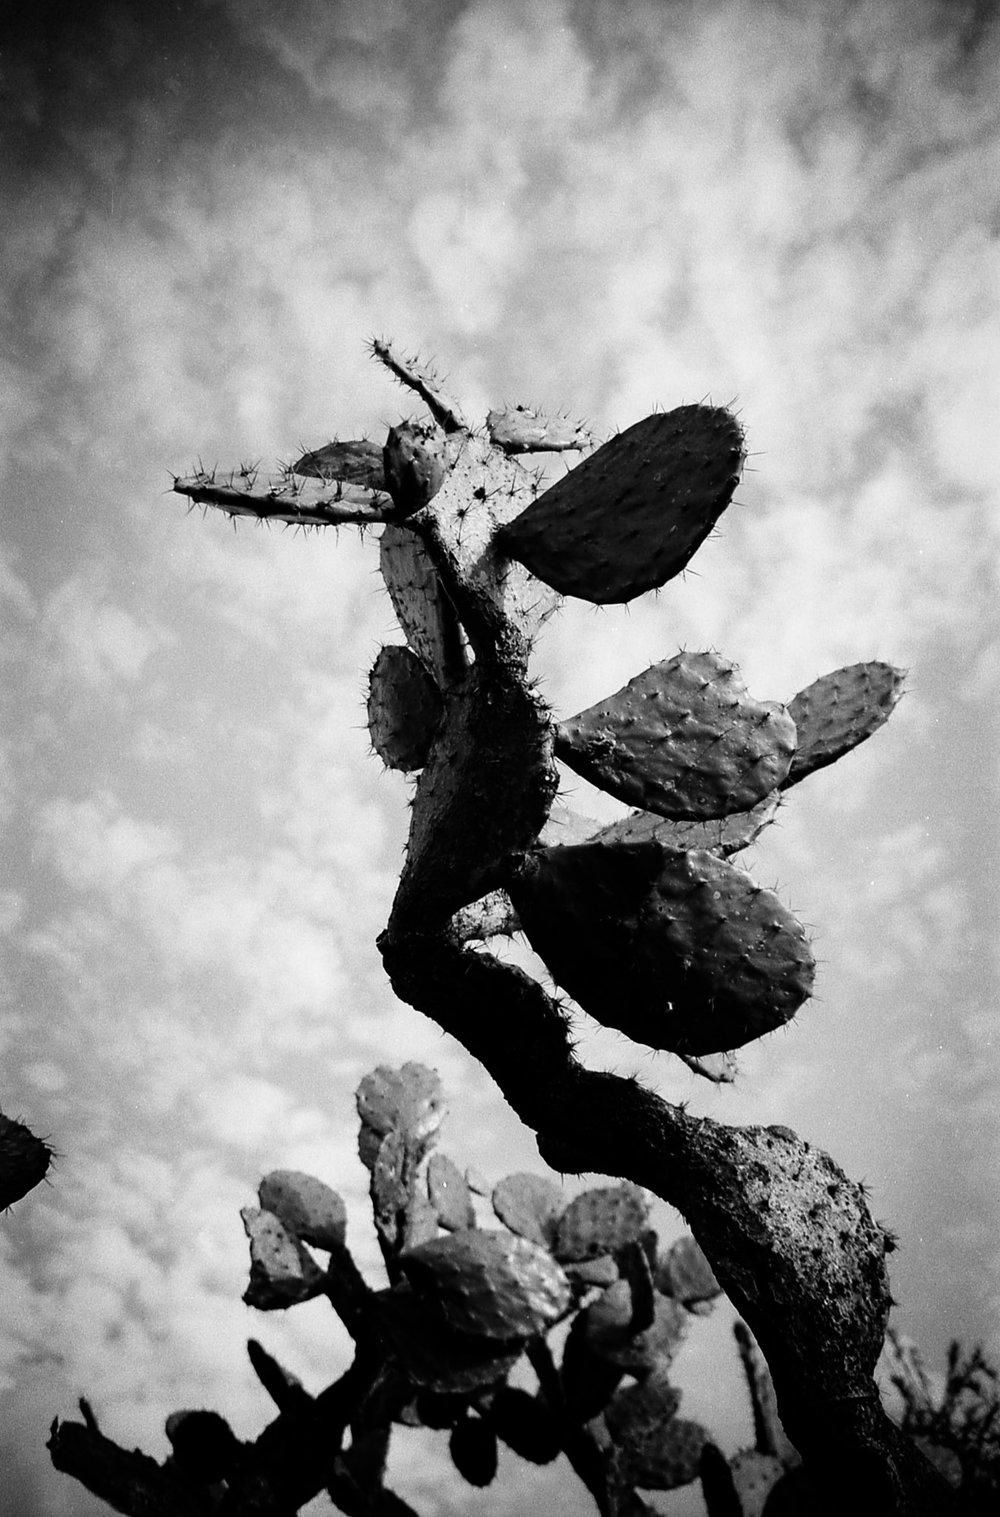 Cactus, 'Succulent Mexico' Series | Mexico